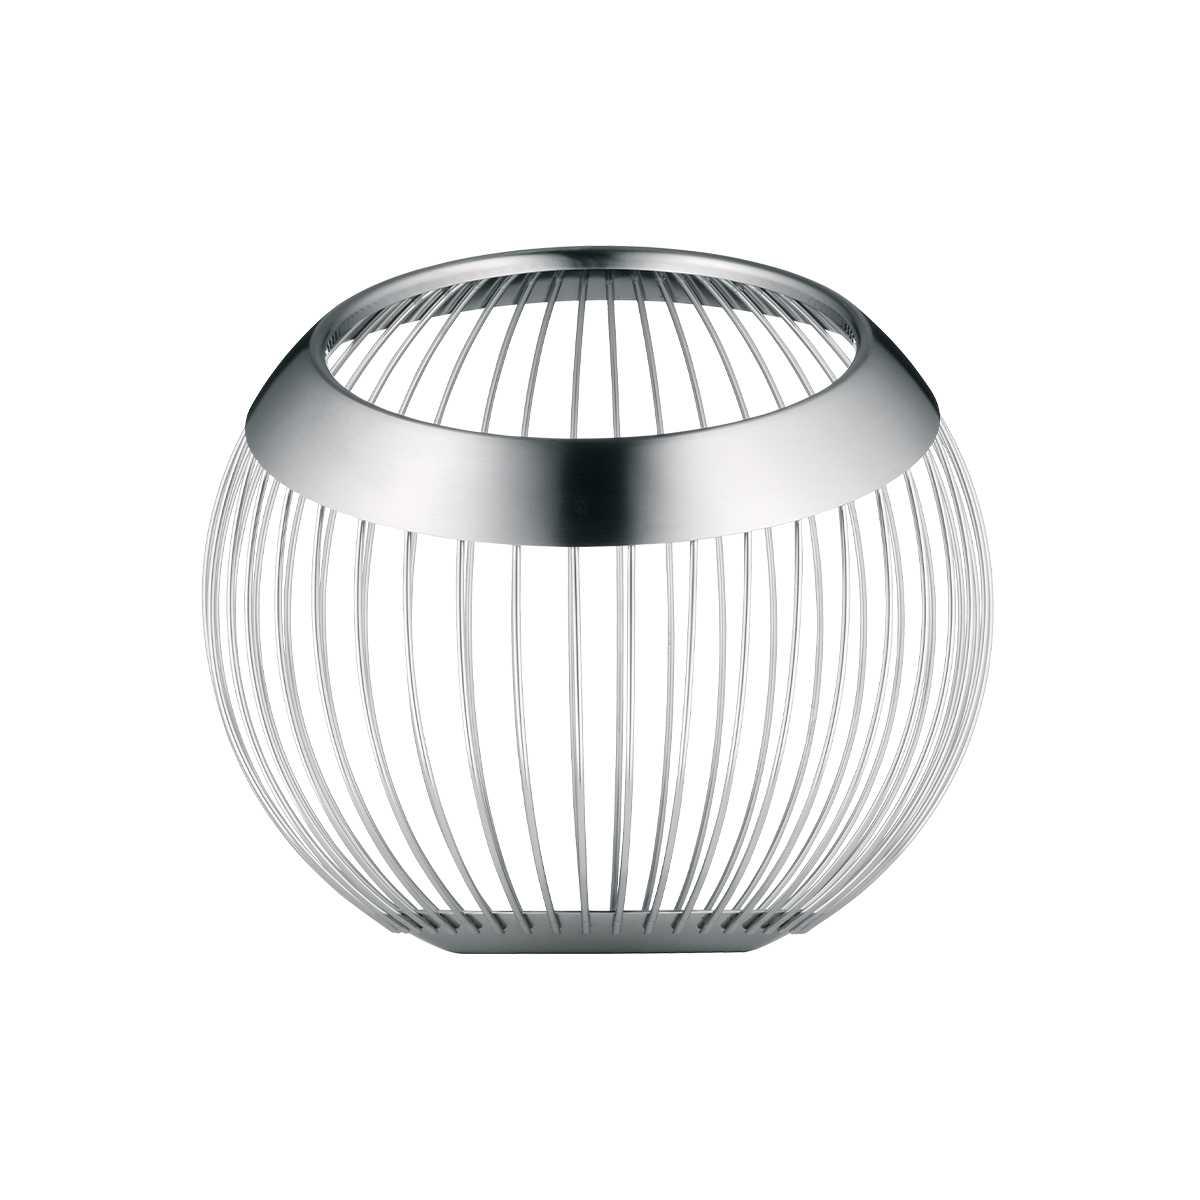 Онлайн каталог PROMENU: Корзина WMF HOME DECOR, диаметр 13 см, ширина 18,5 см, серебристый WMF 06 6507 6030